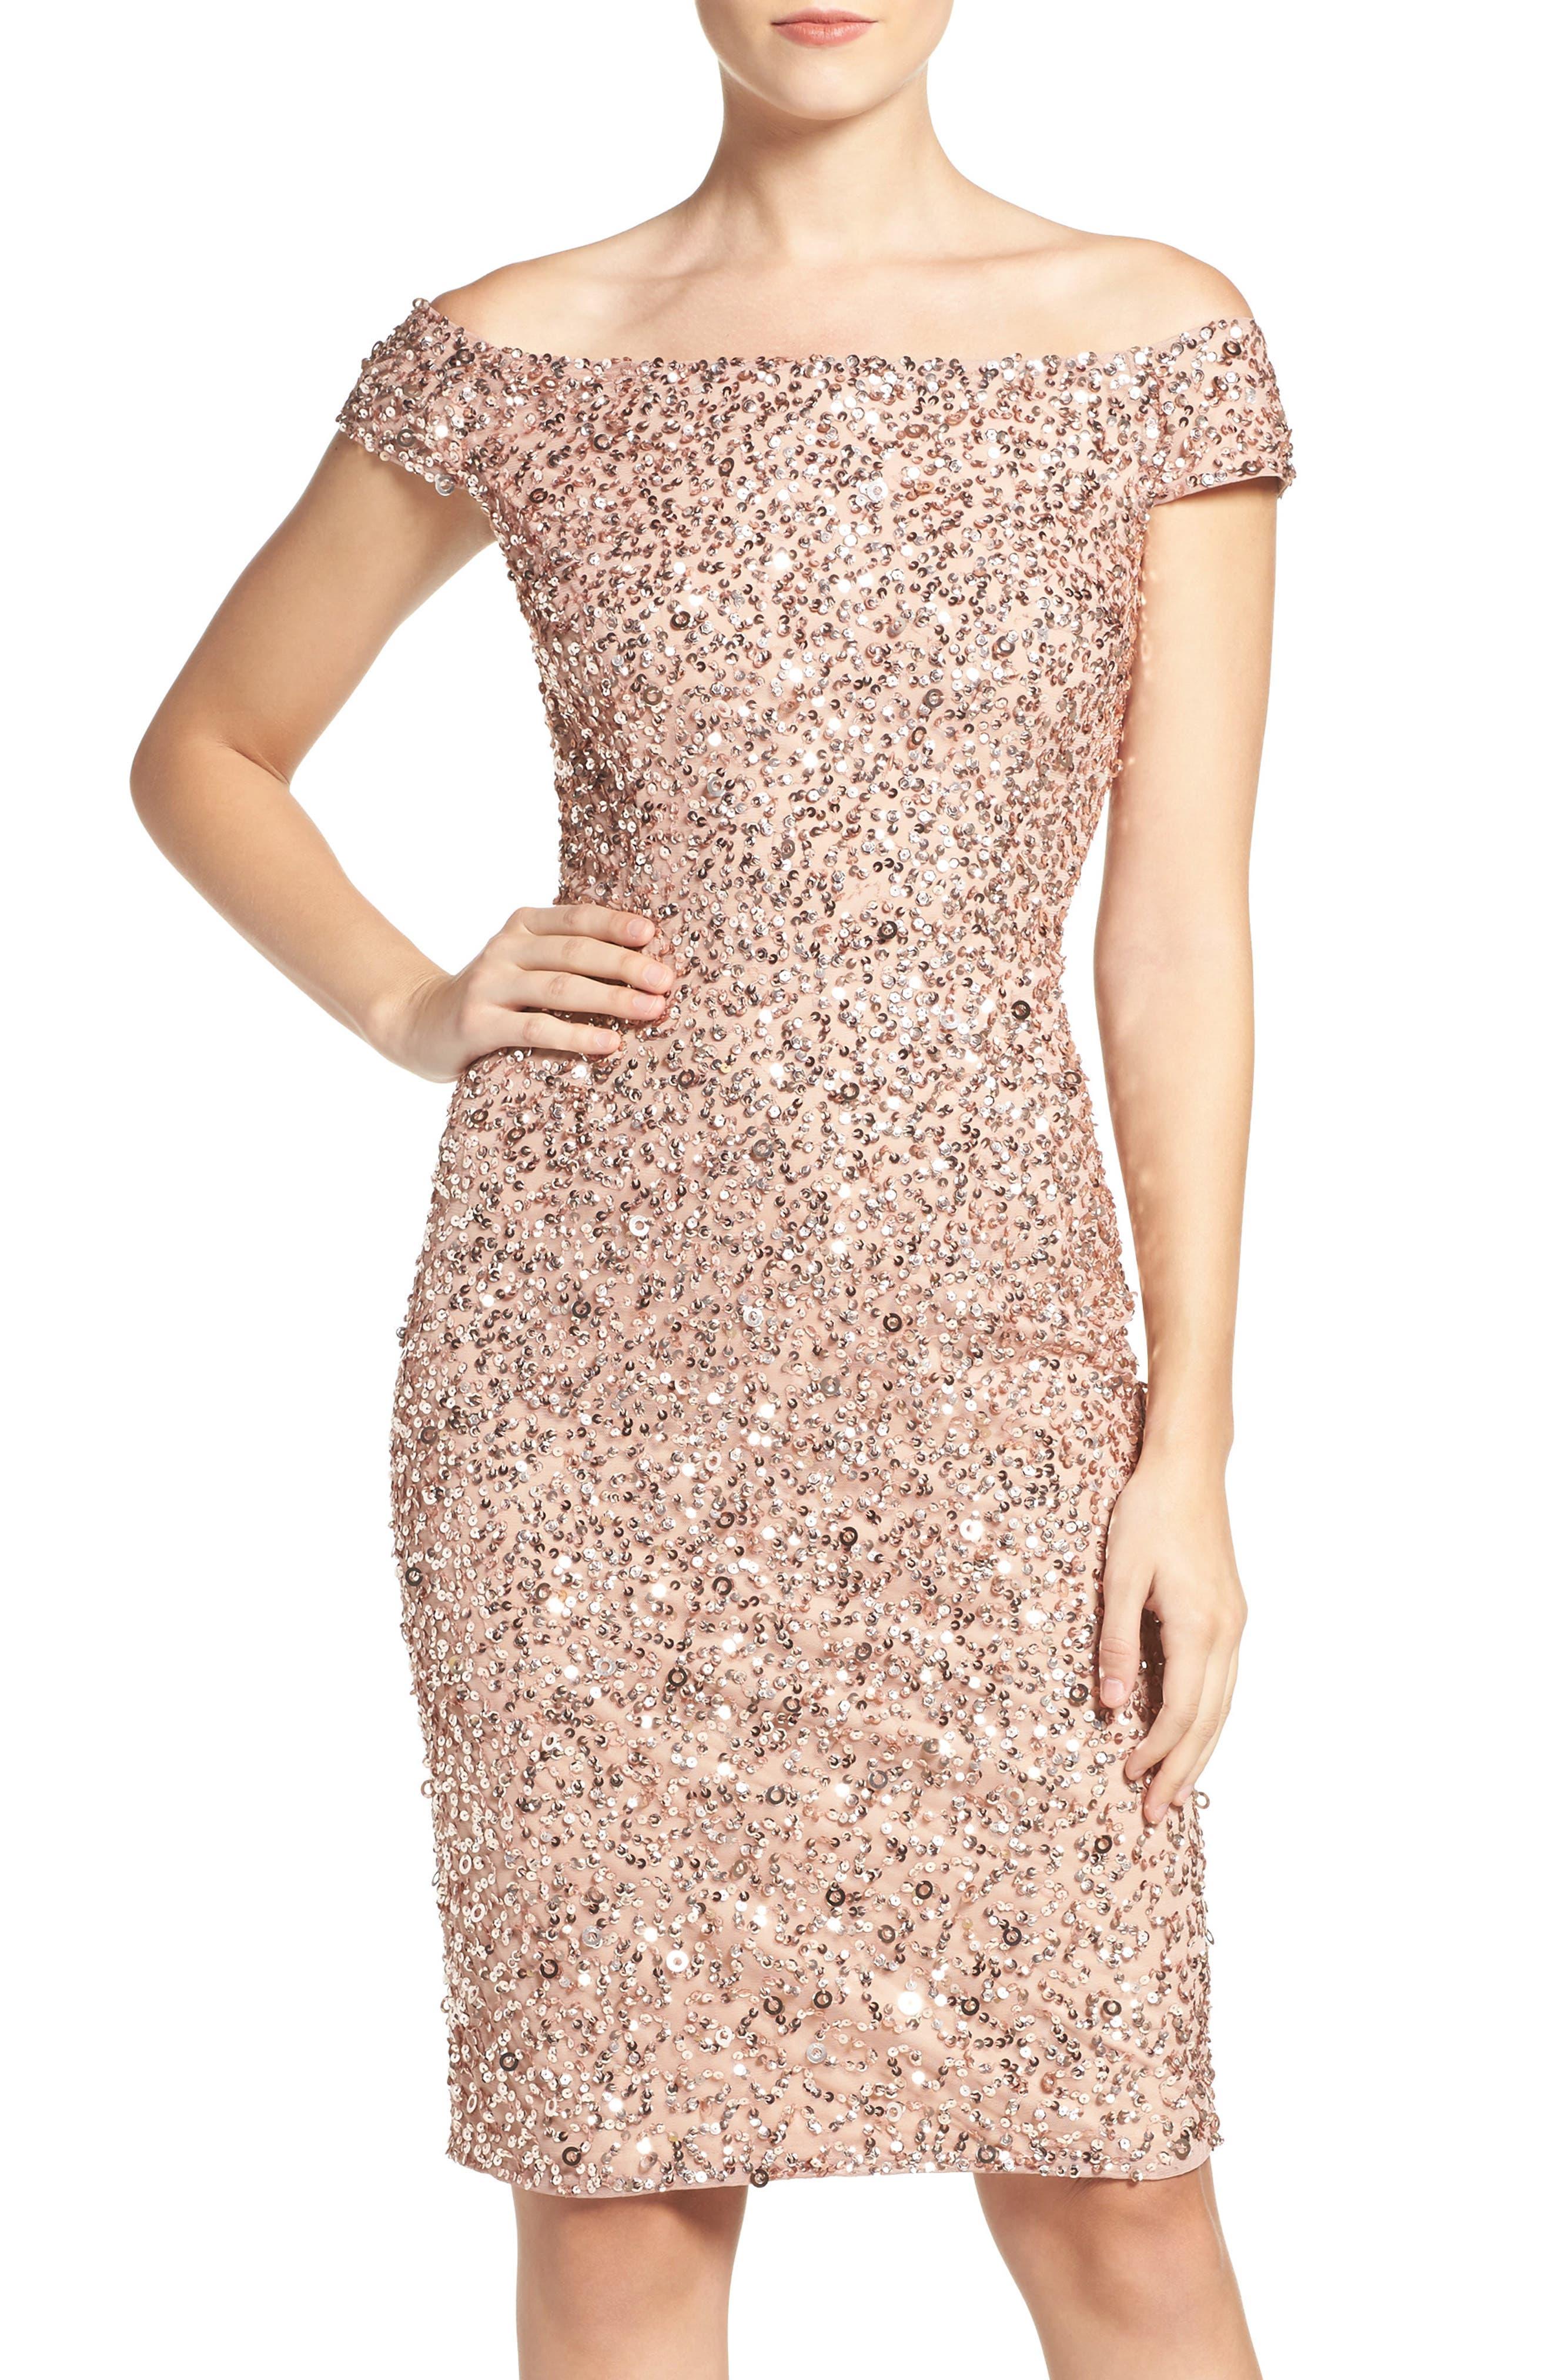 Adrianna Papell Off the Shoulder Sequin Sheath Dress (Regular & Petite)